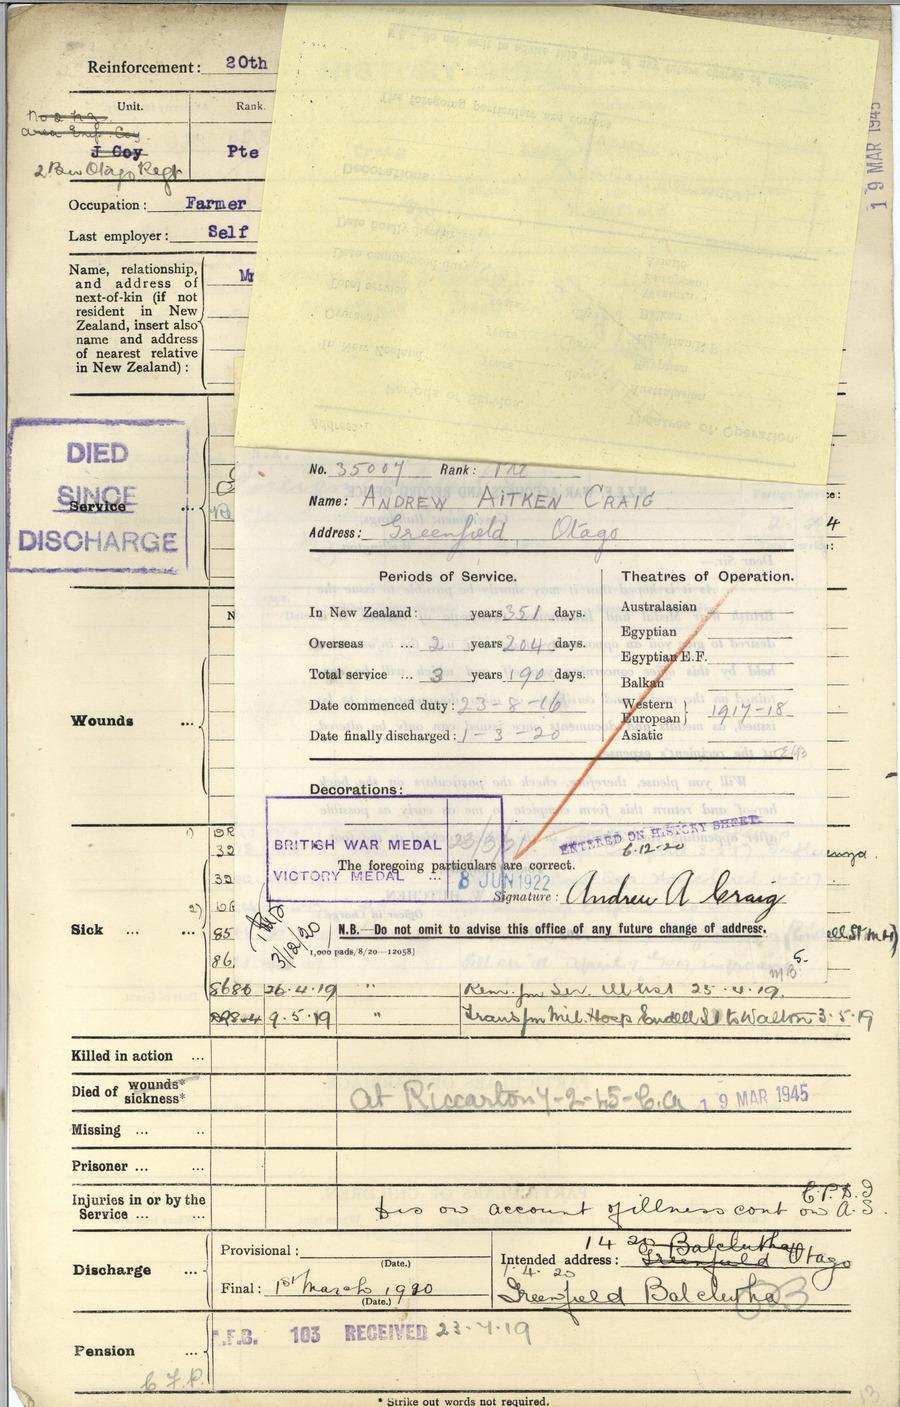 CRAIG, Andrew Aitken - WW1 35007 - Army